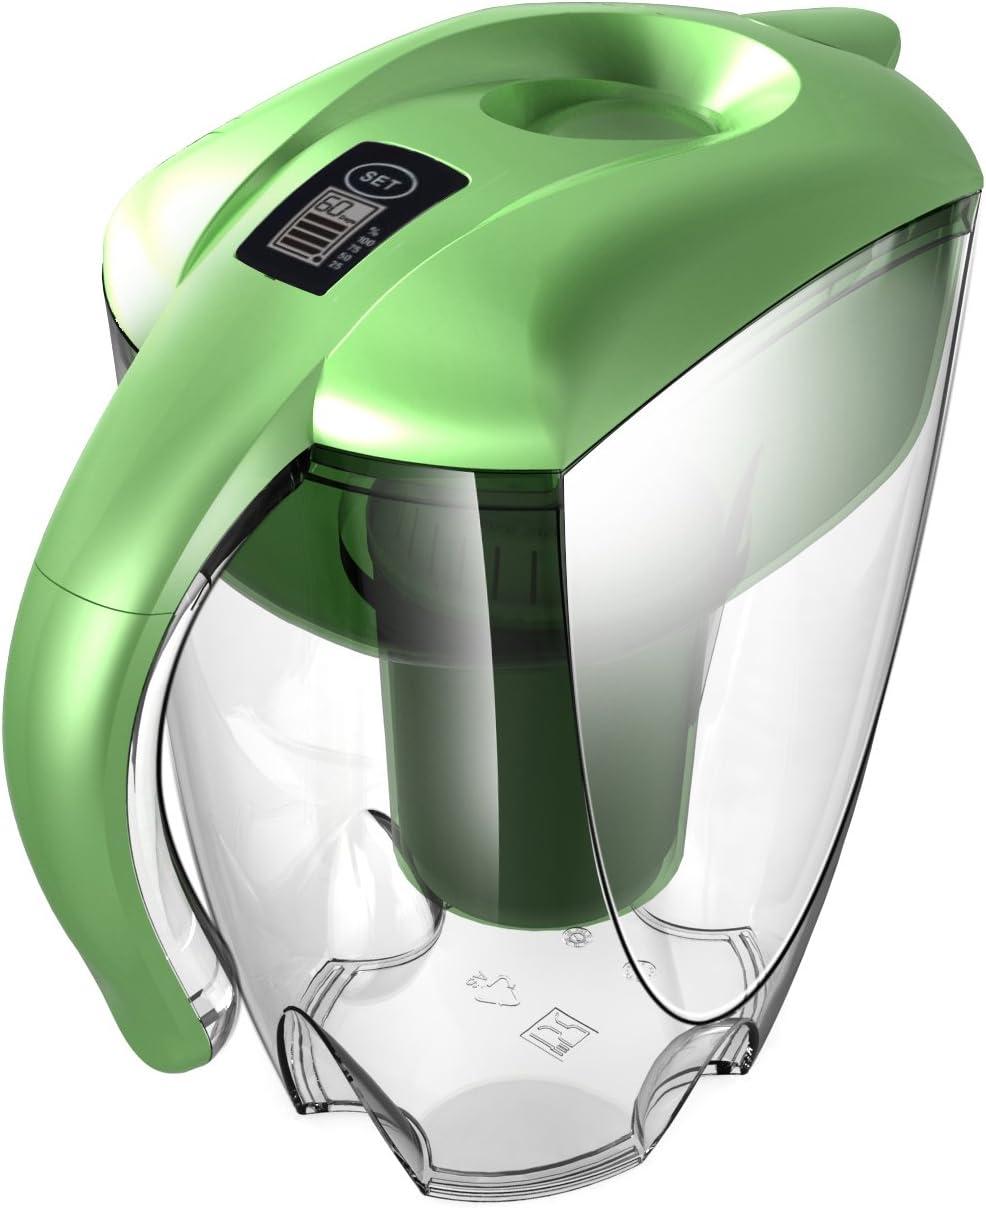 DIF Hervidor de agua de filtro para el hogar, 3.5 l de energía ...